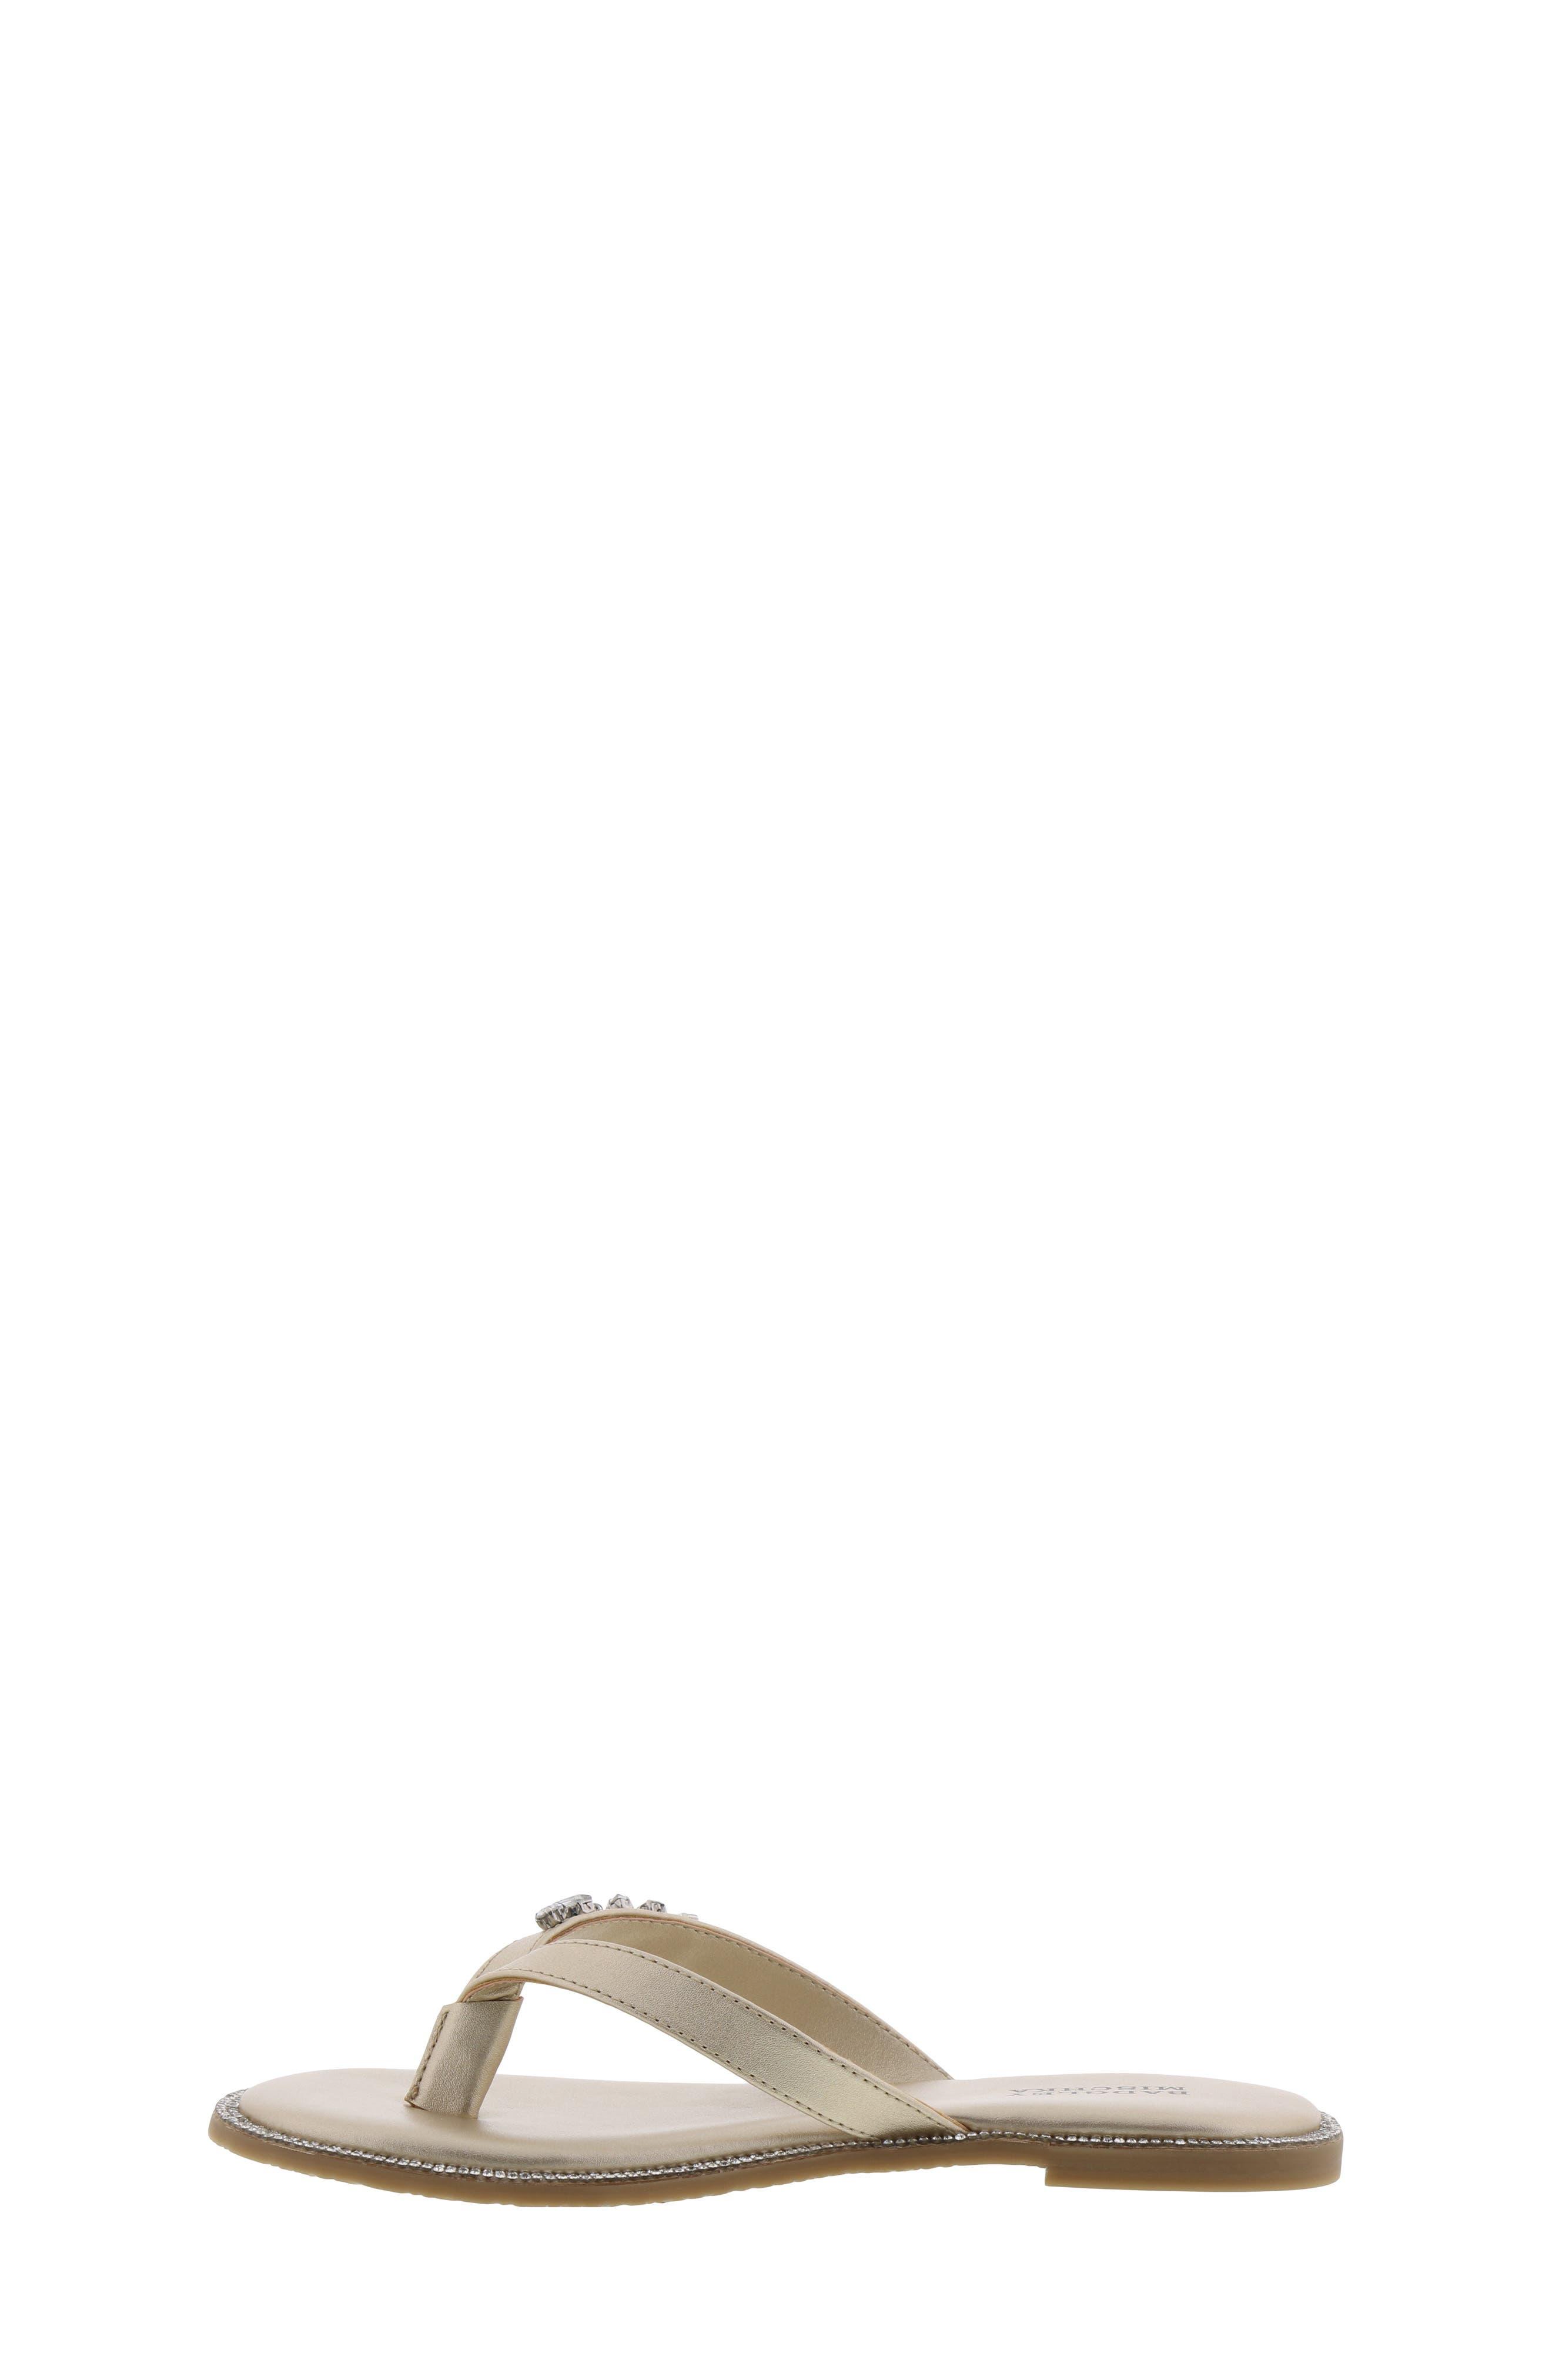 BADGLEY MISCHKA COLLECTION, Badgley Mischka Missy Flip Flop, Alternate thumbnail 8, color, LIGHT GOLD SHIMMER